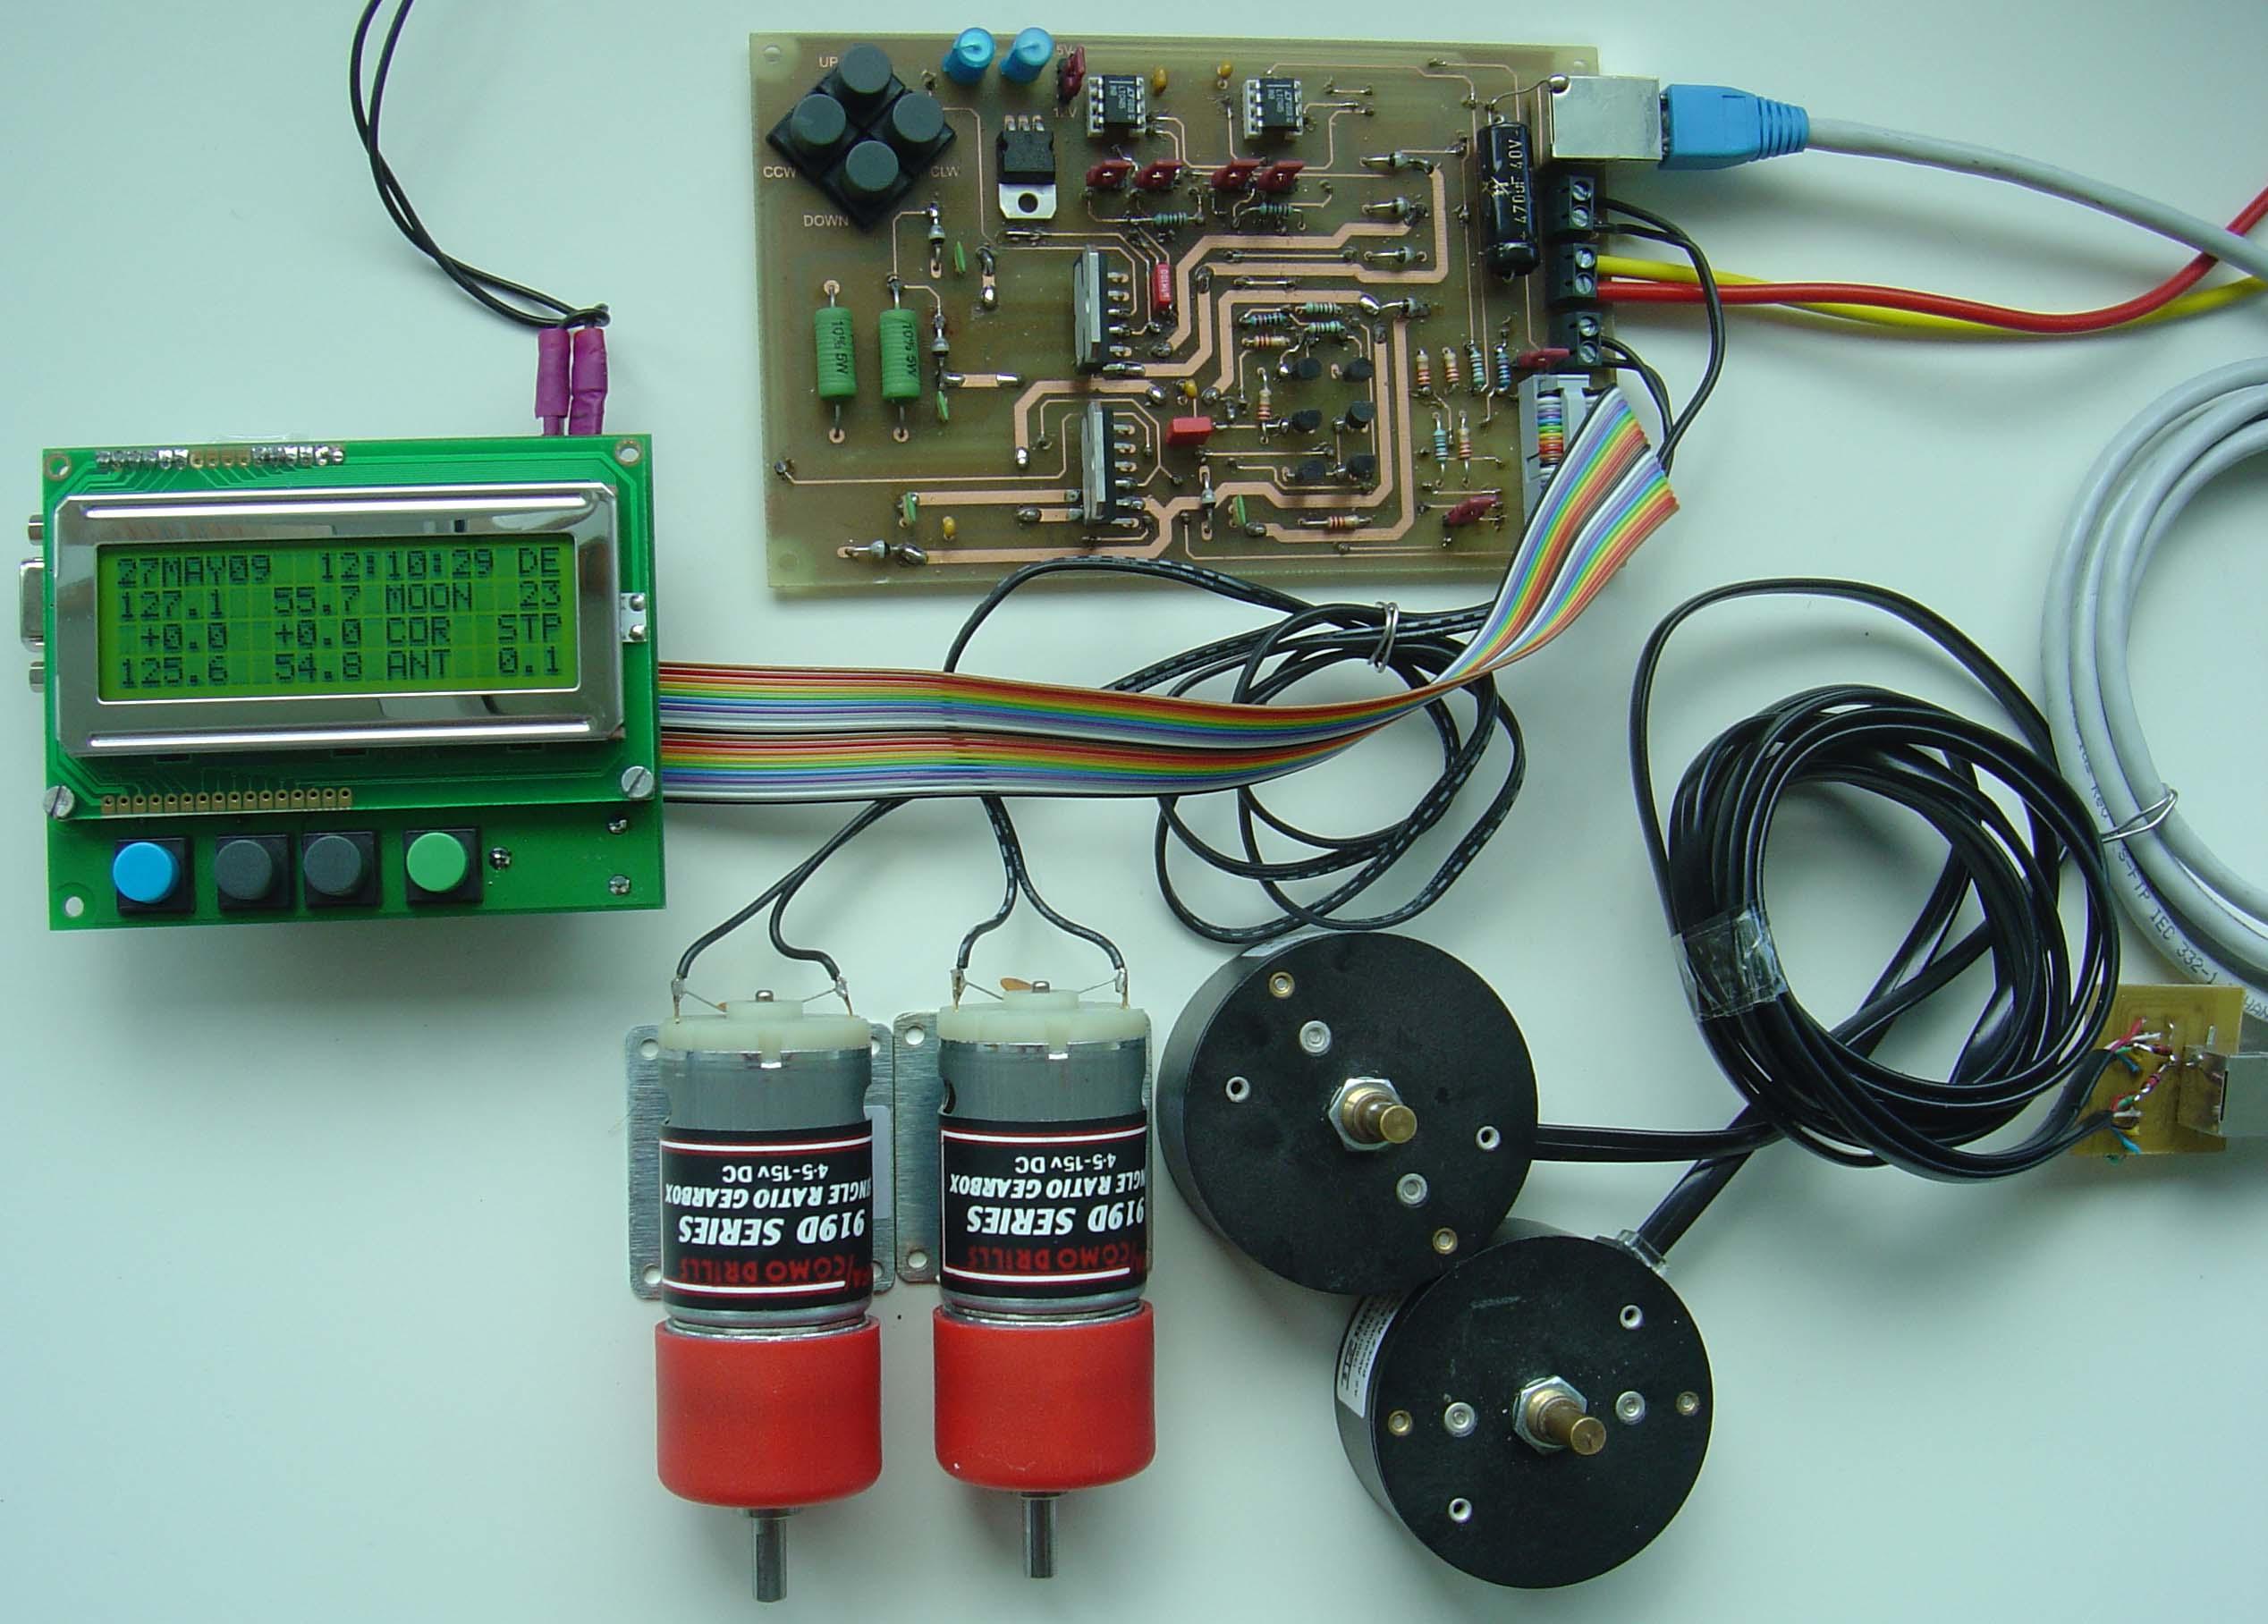 EME Antenna Control System,OE5JFL